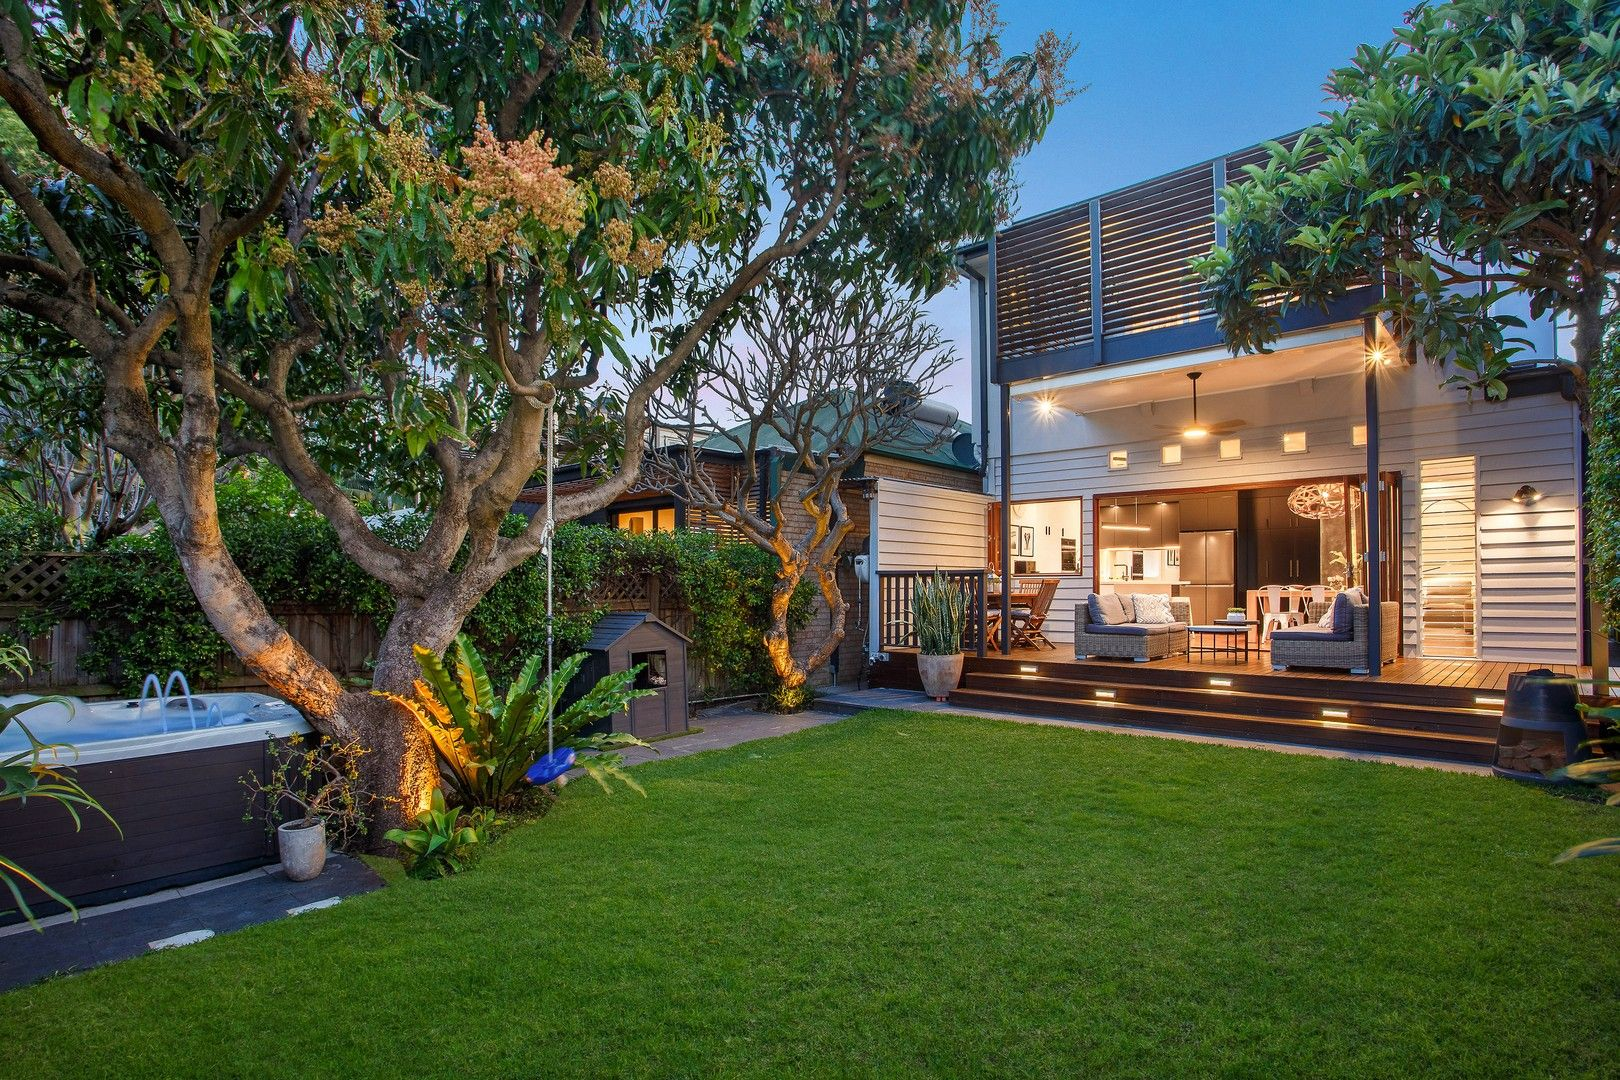 4 bedrooms House in 24A Belmore Street ROZELLE NSW, 2039